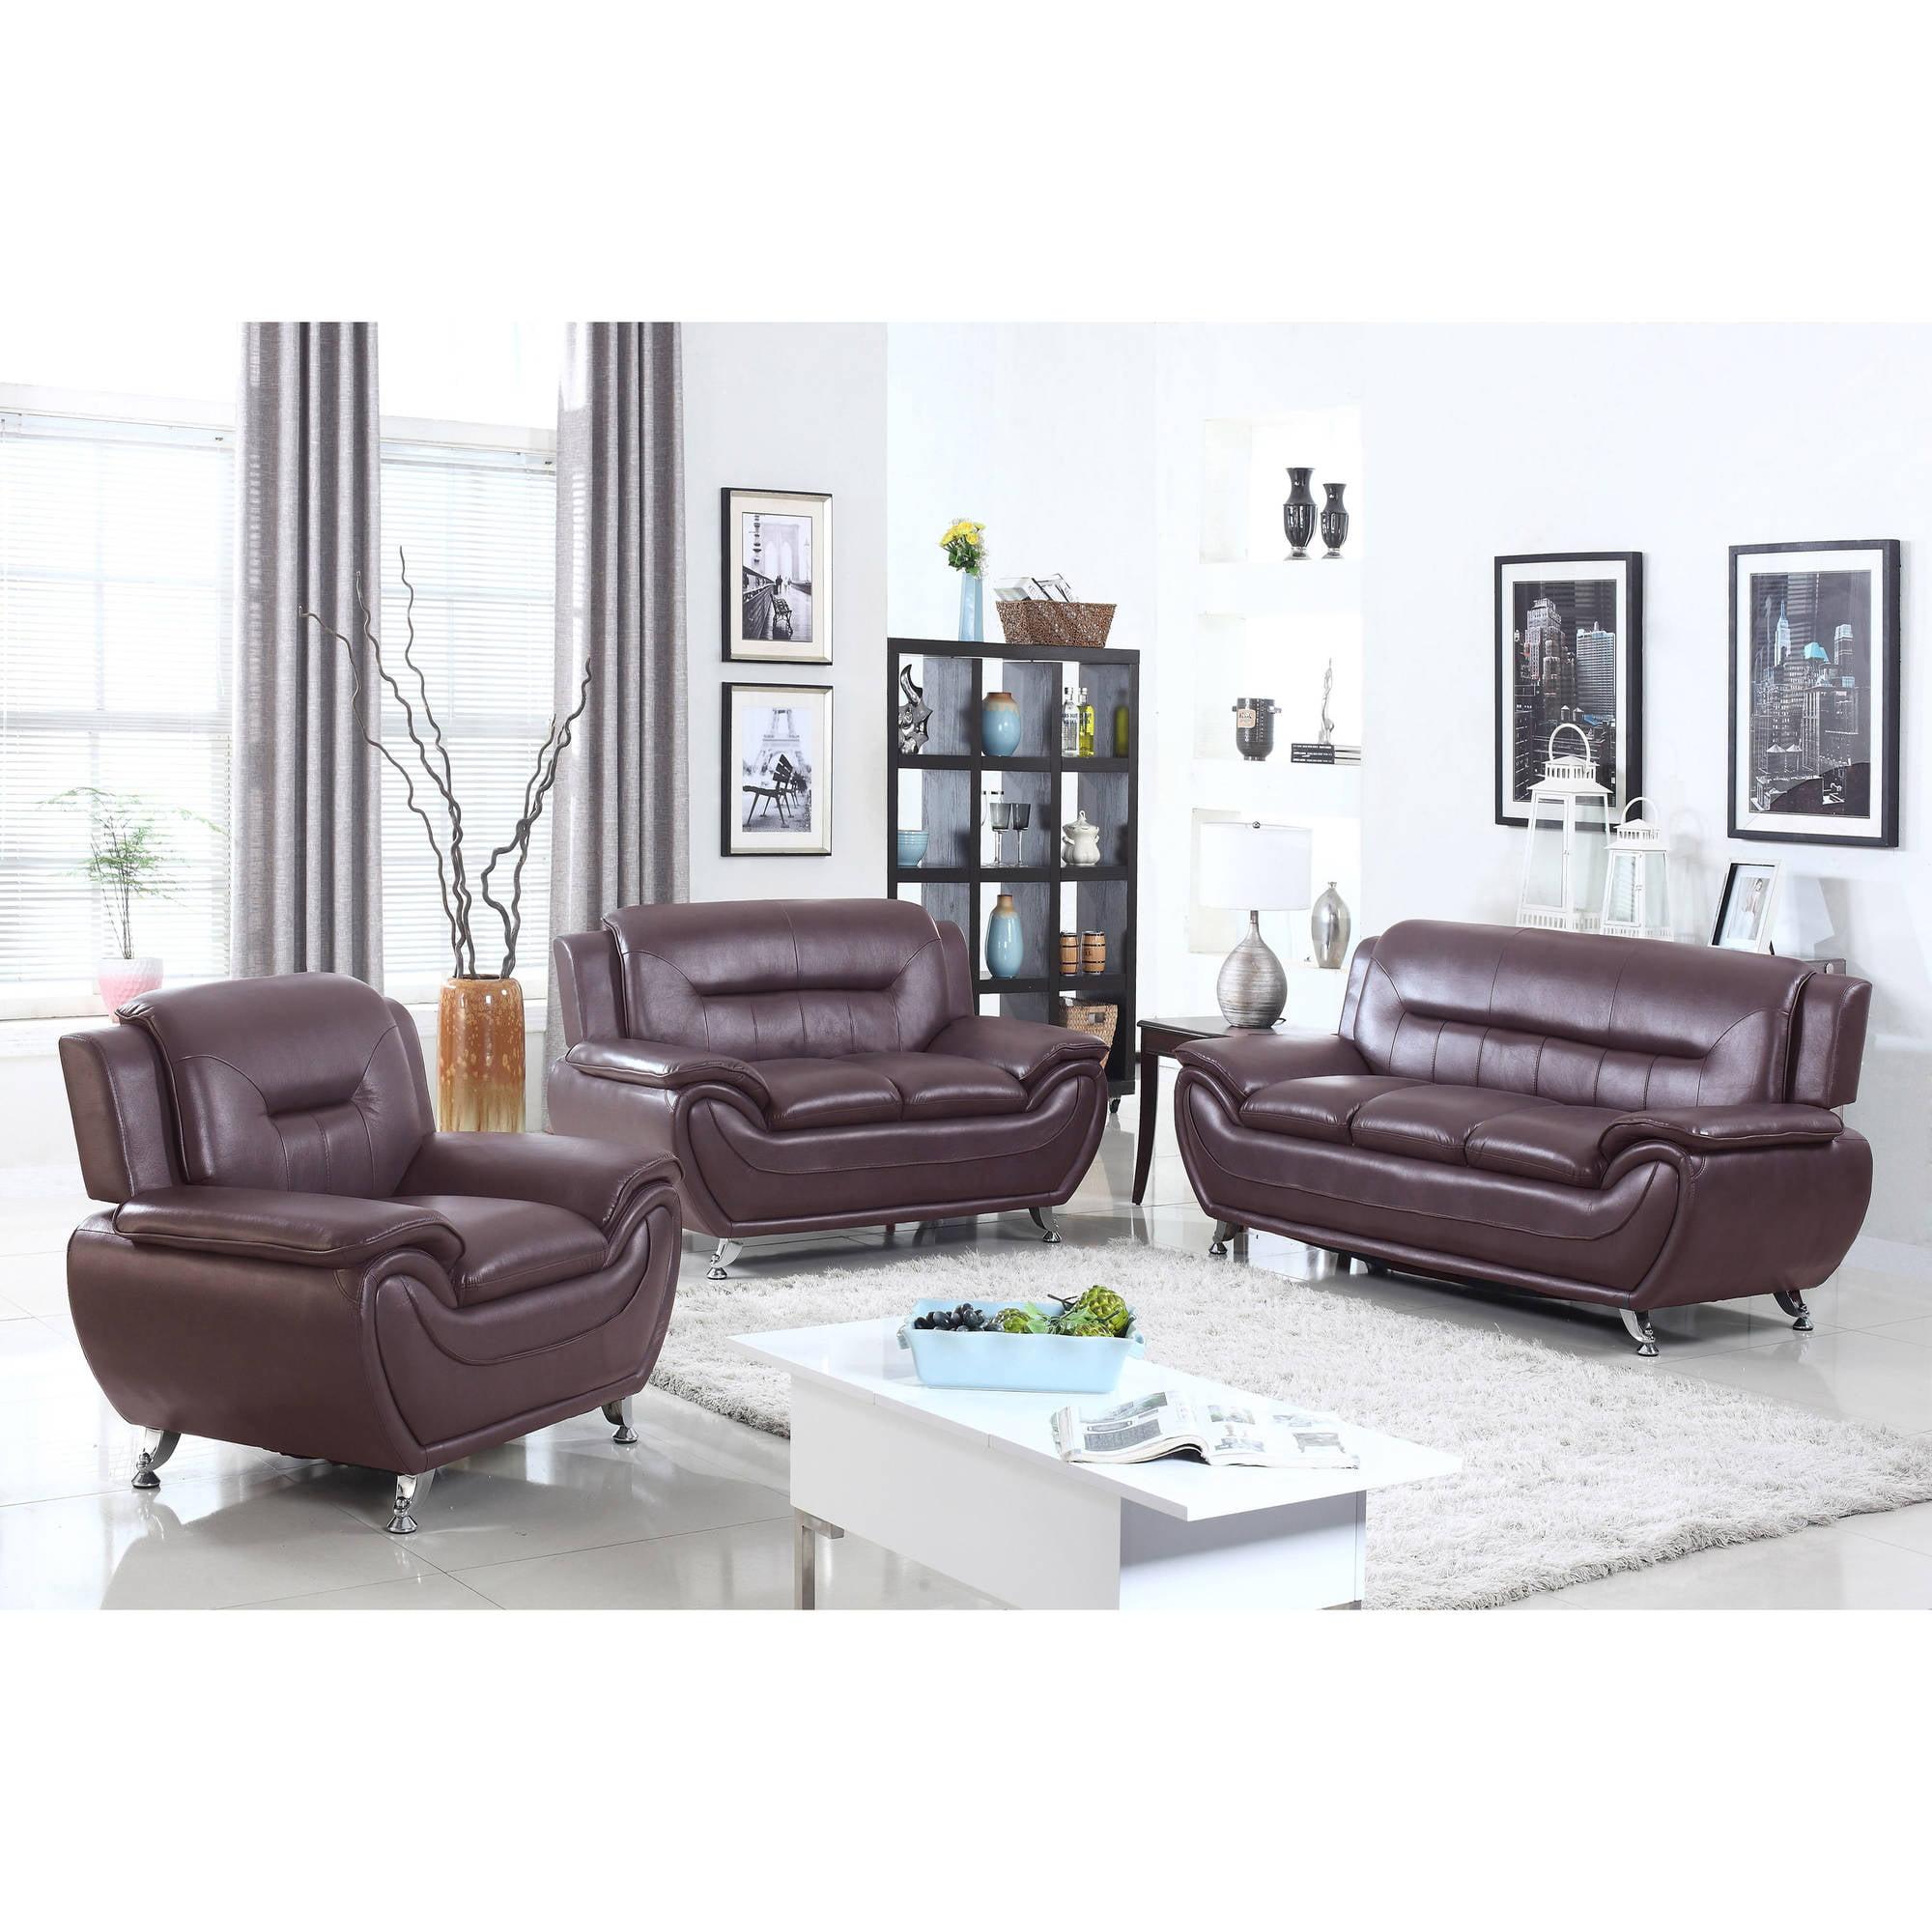 UFE Norton Dark Brown Faux Leather 3 Piece Modern Living Room Sofa